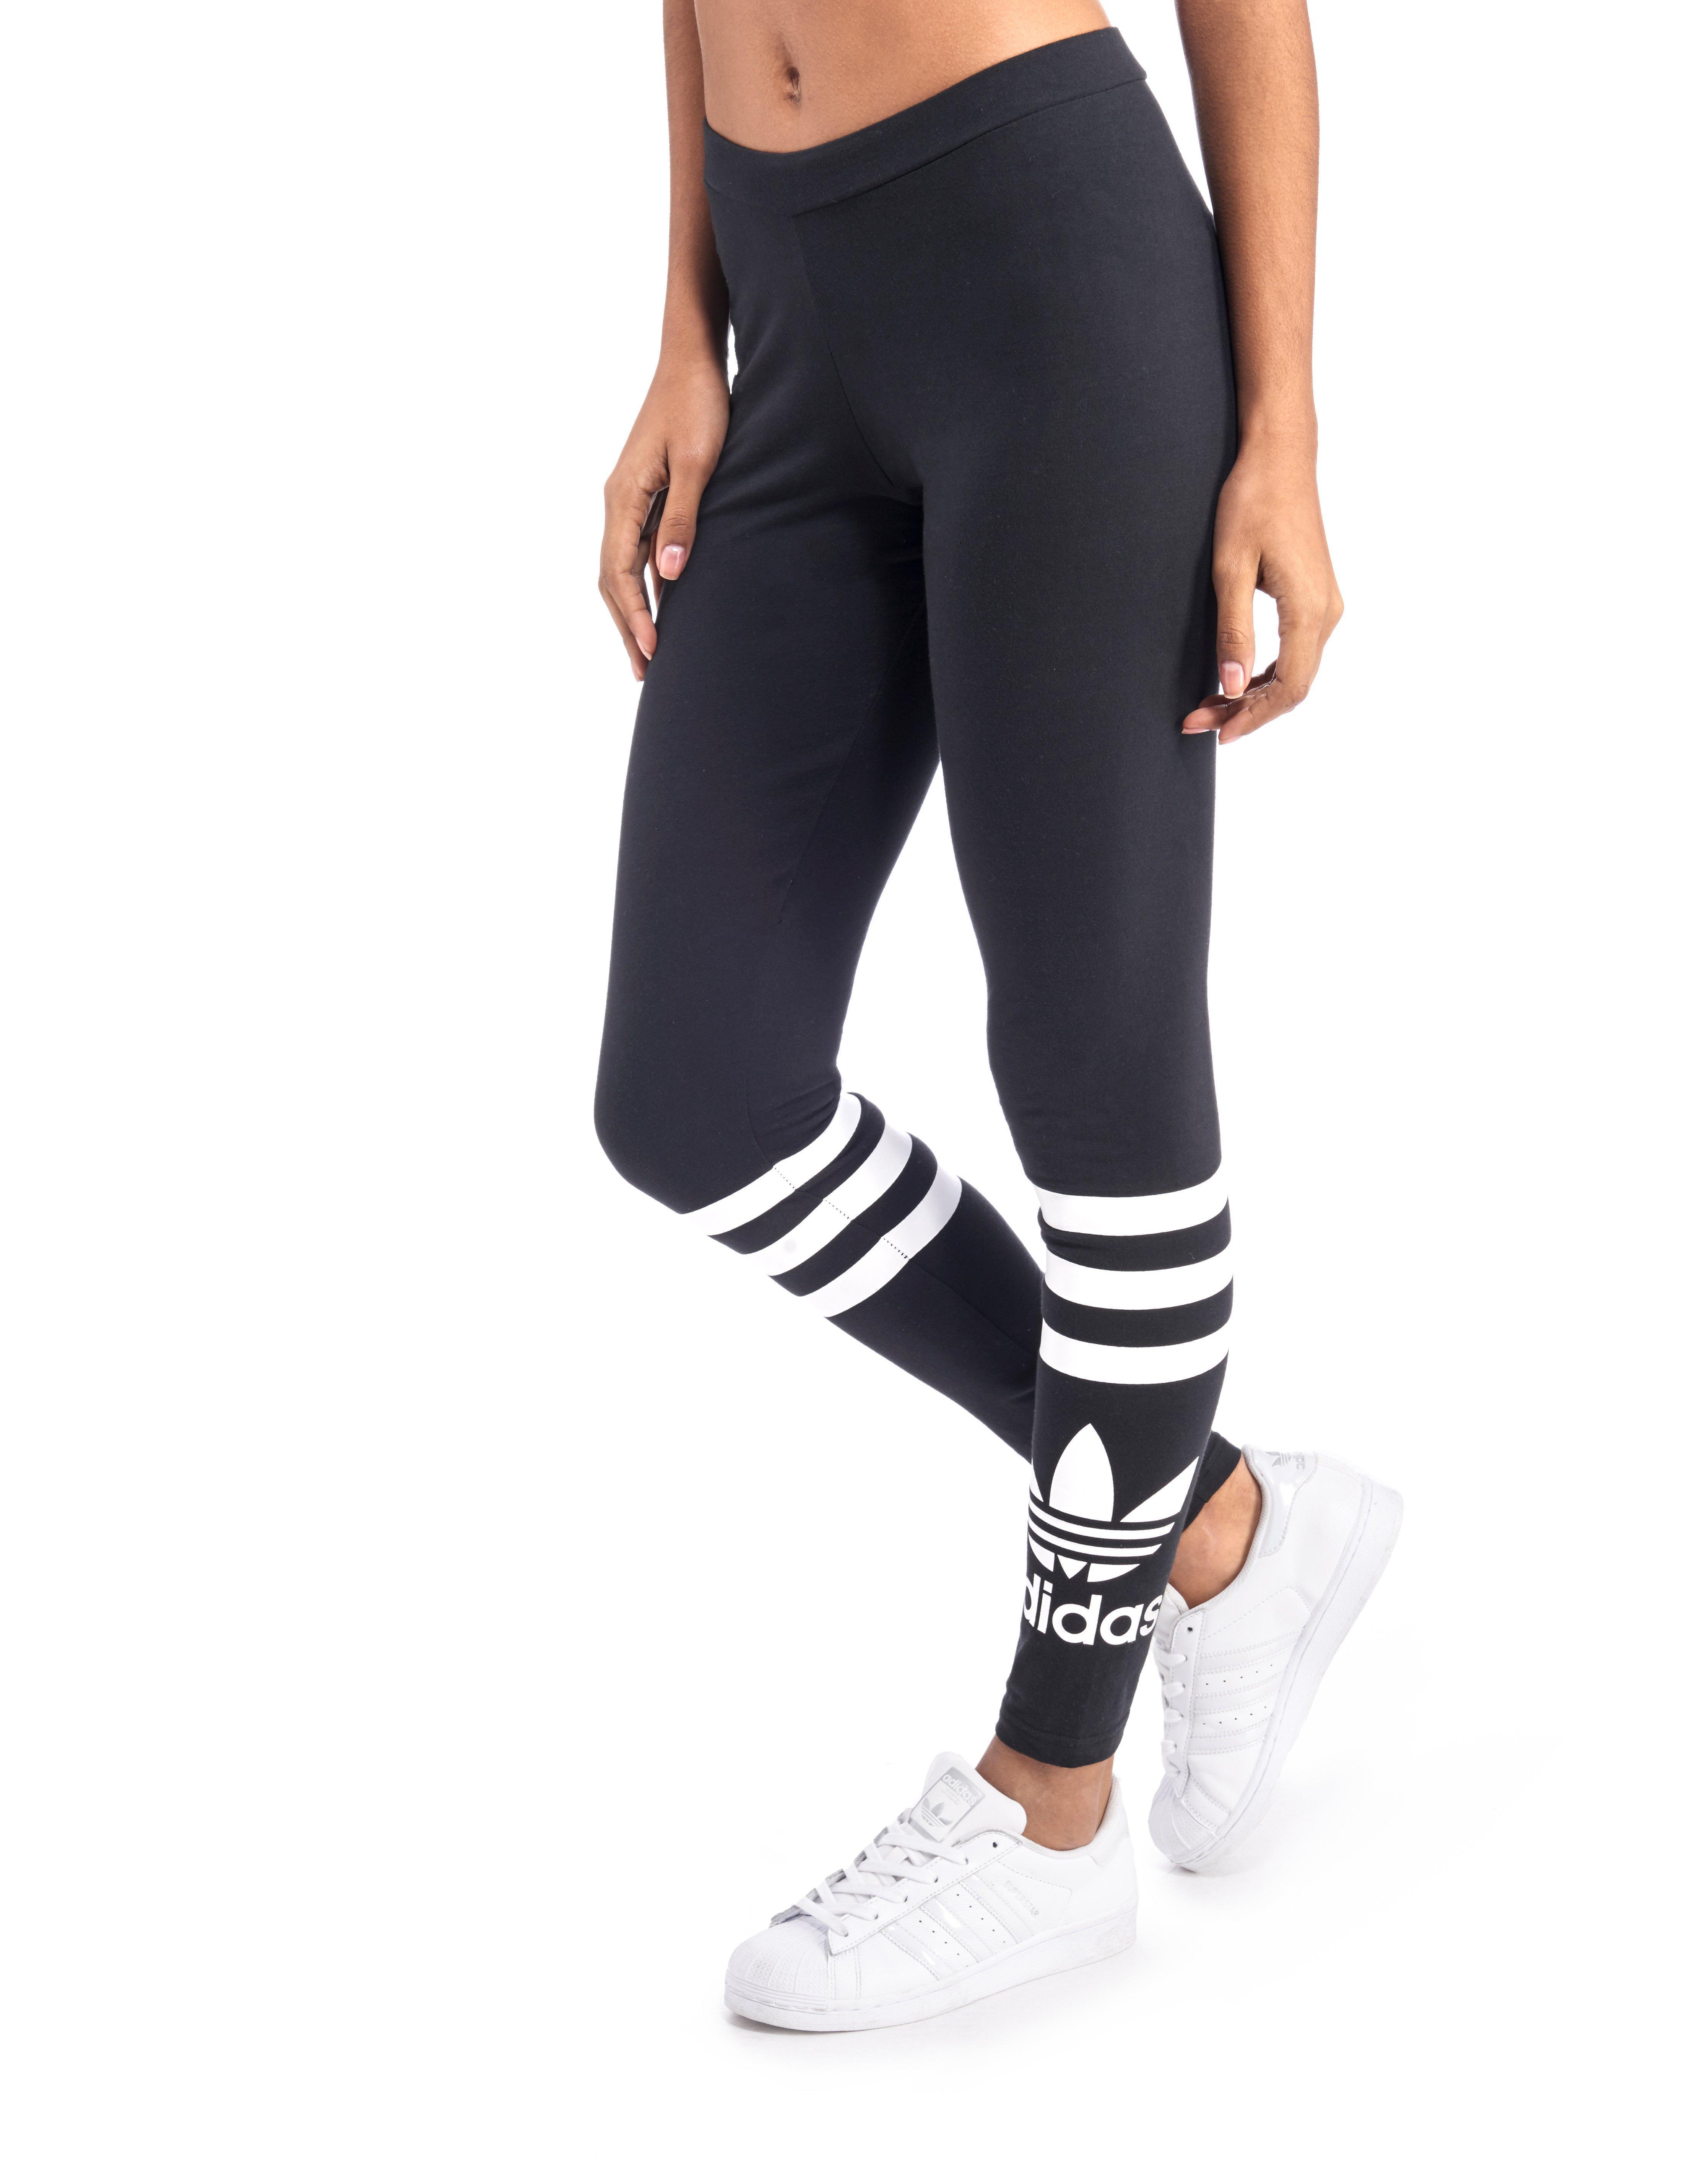 adidas originals street leggings in black lyst. Black Bedroom Furniture Sets. Home Design Ideas